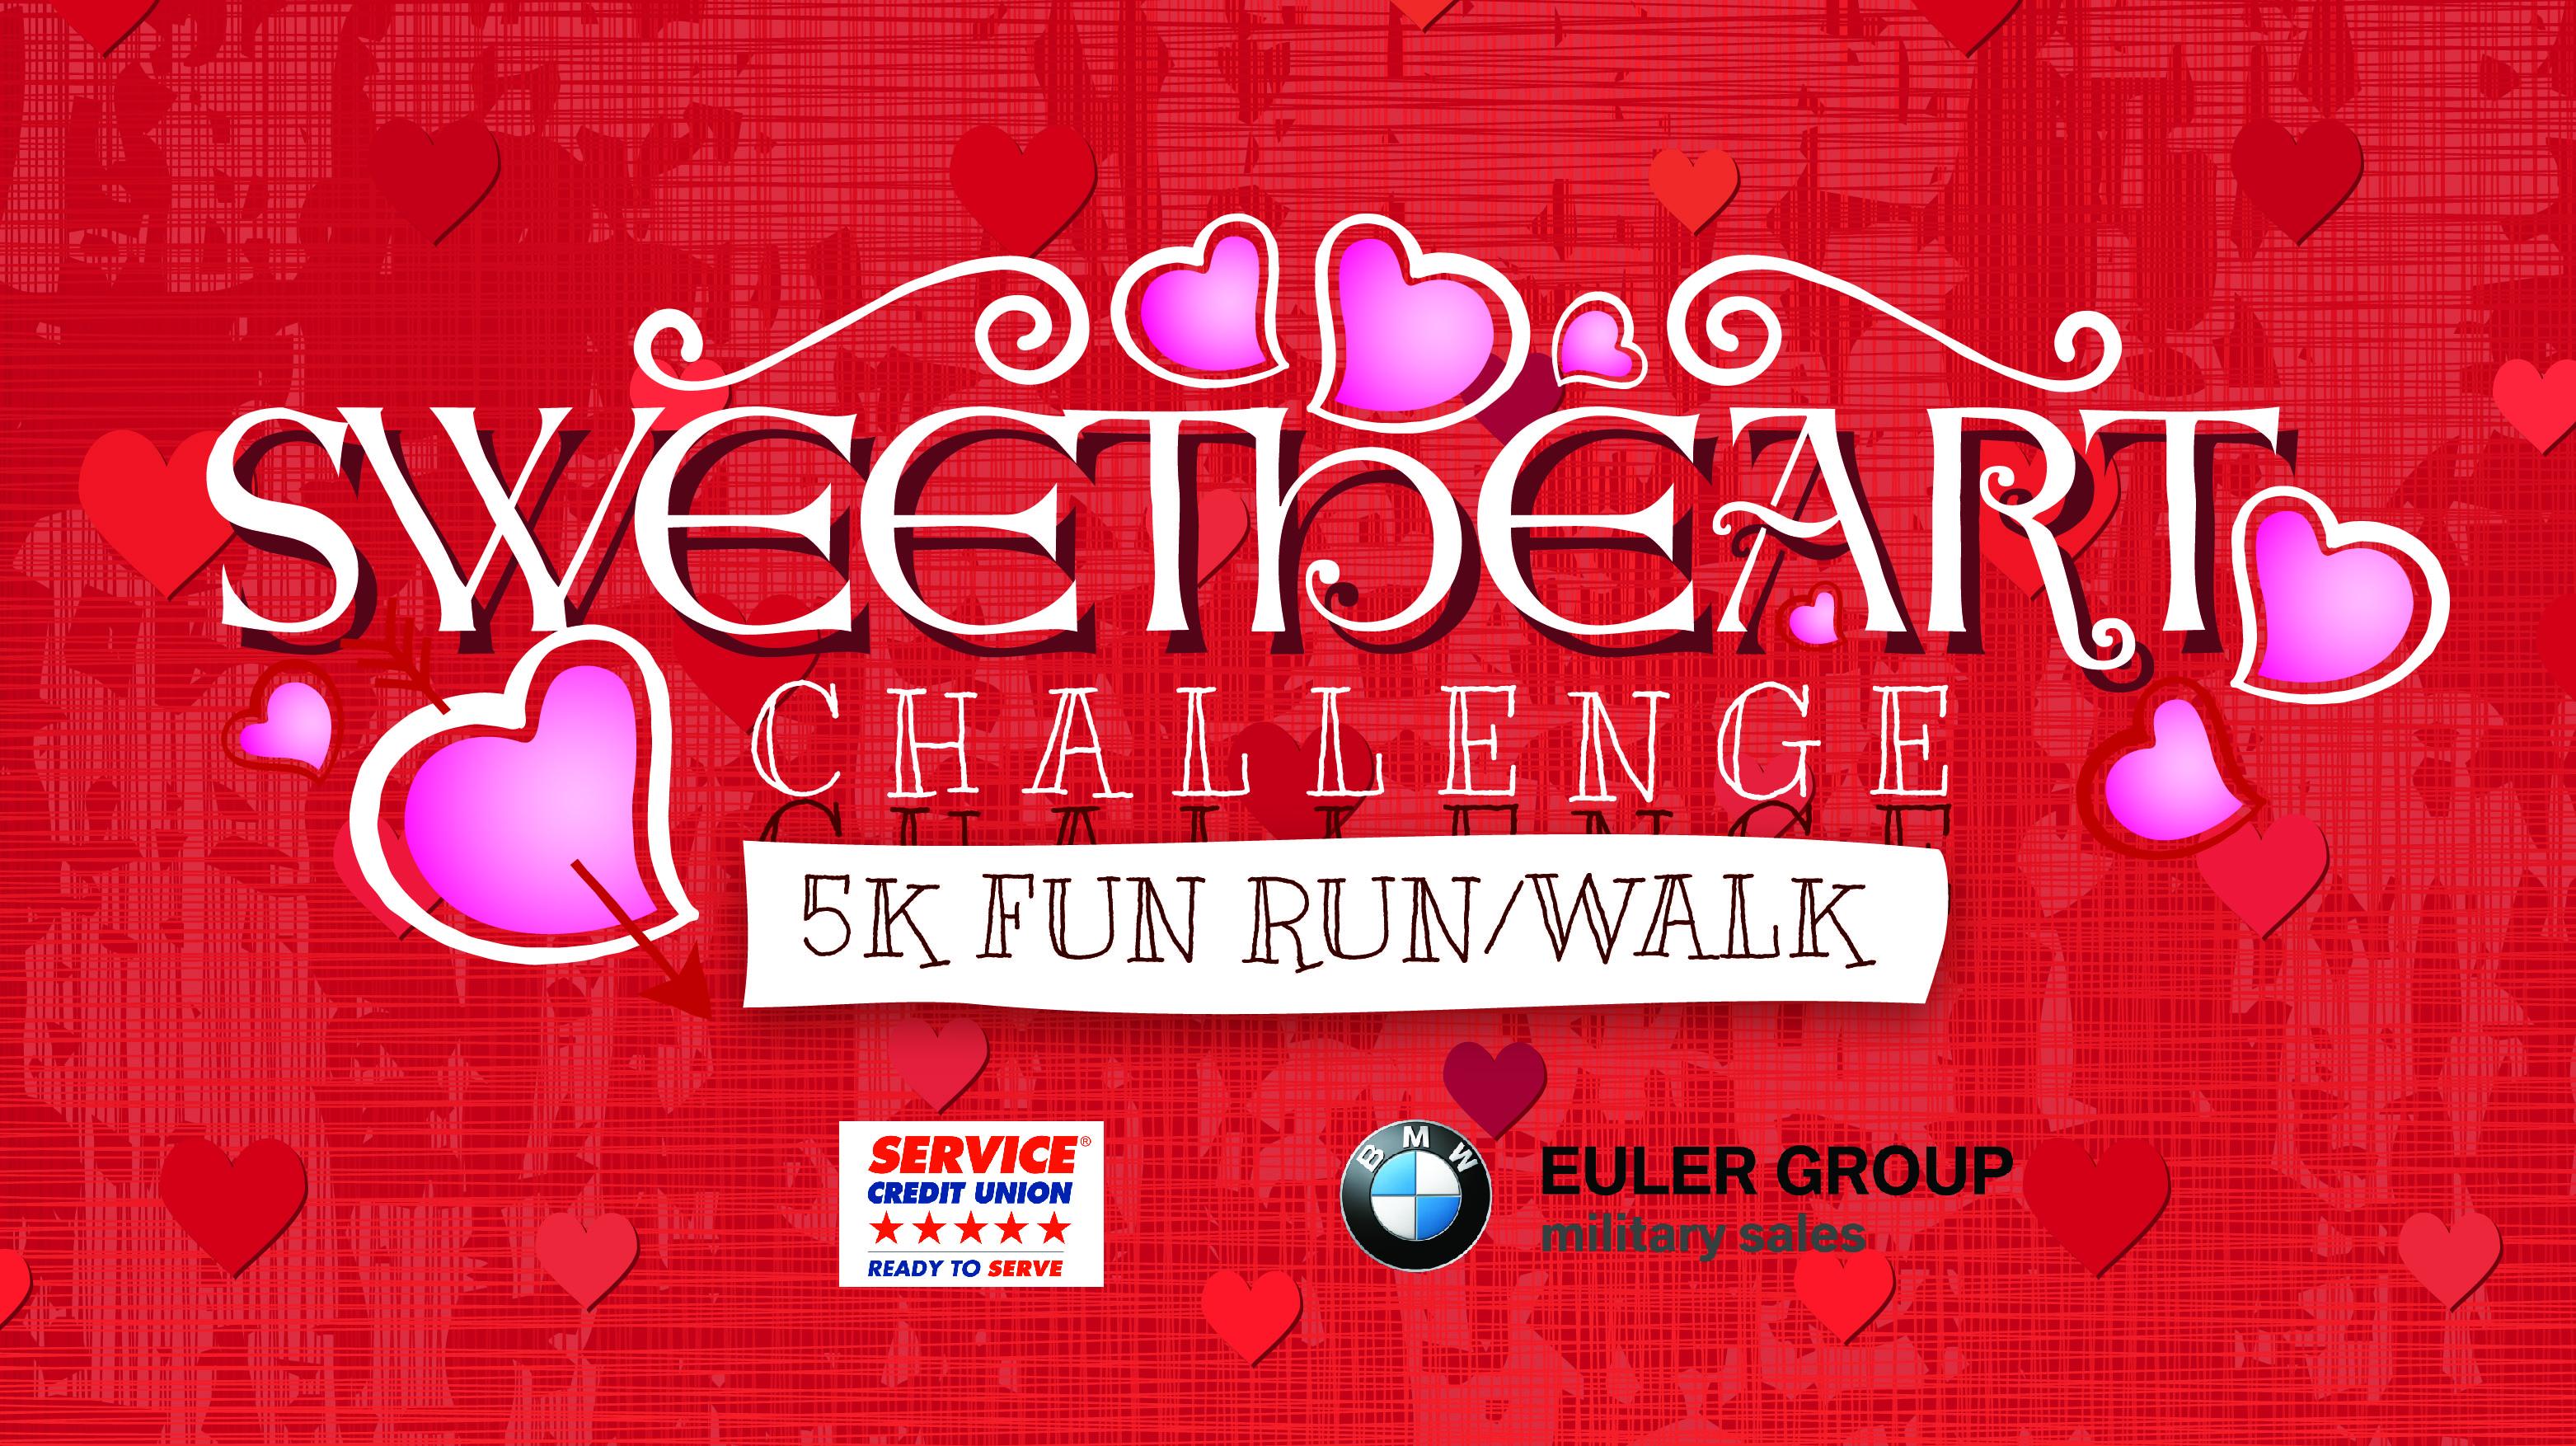 Sweetheart Challenge 5K Run & Walk